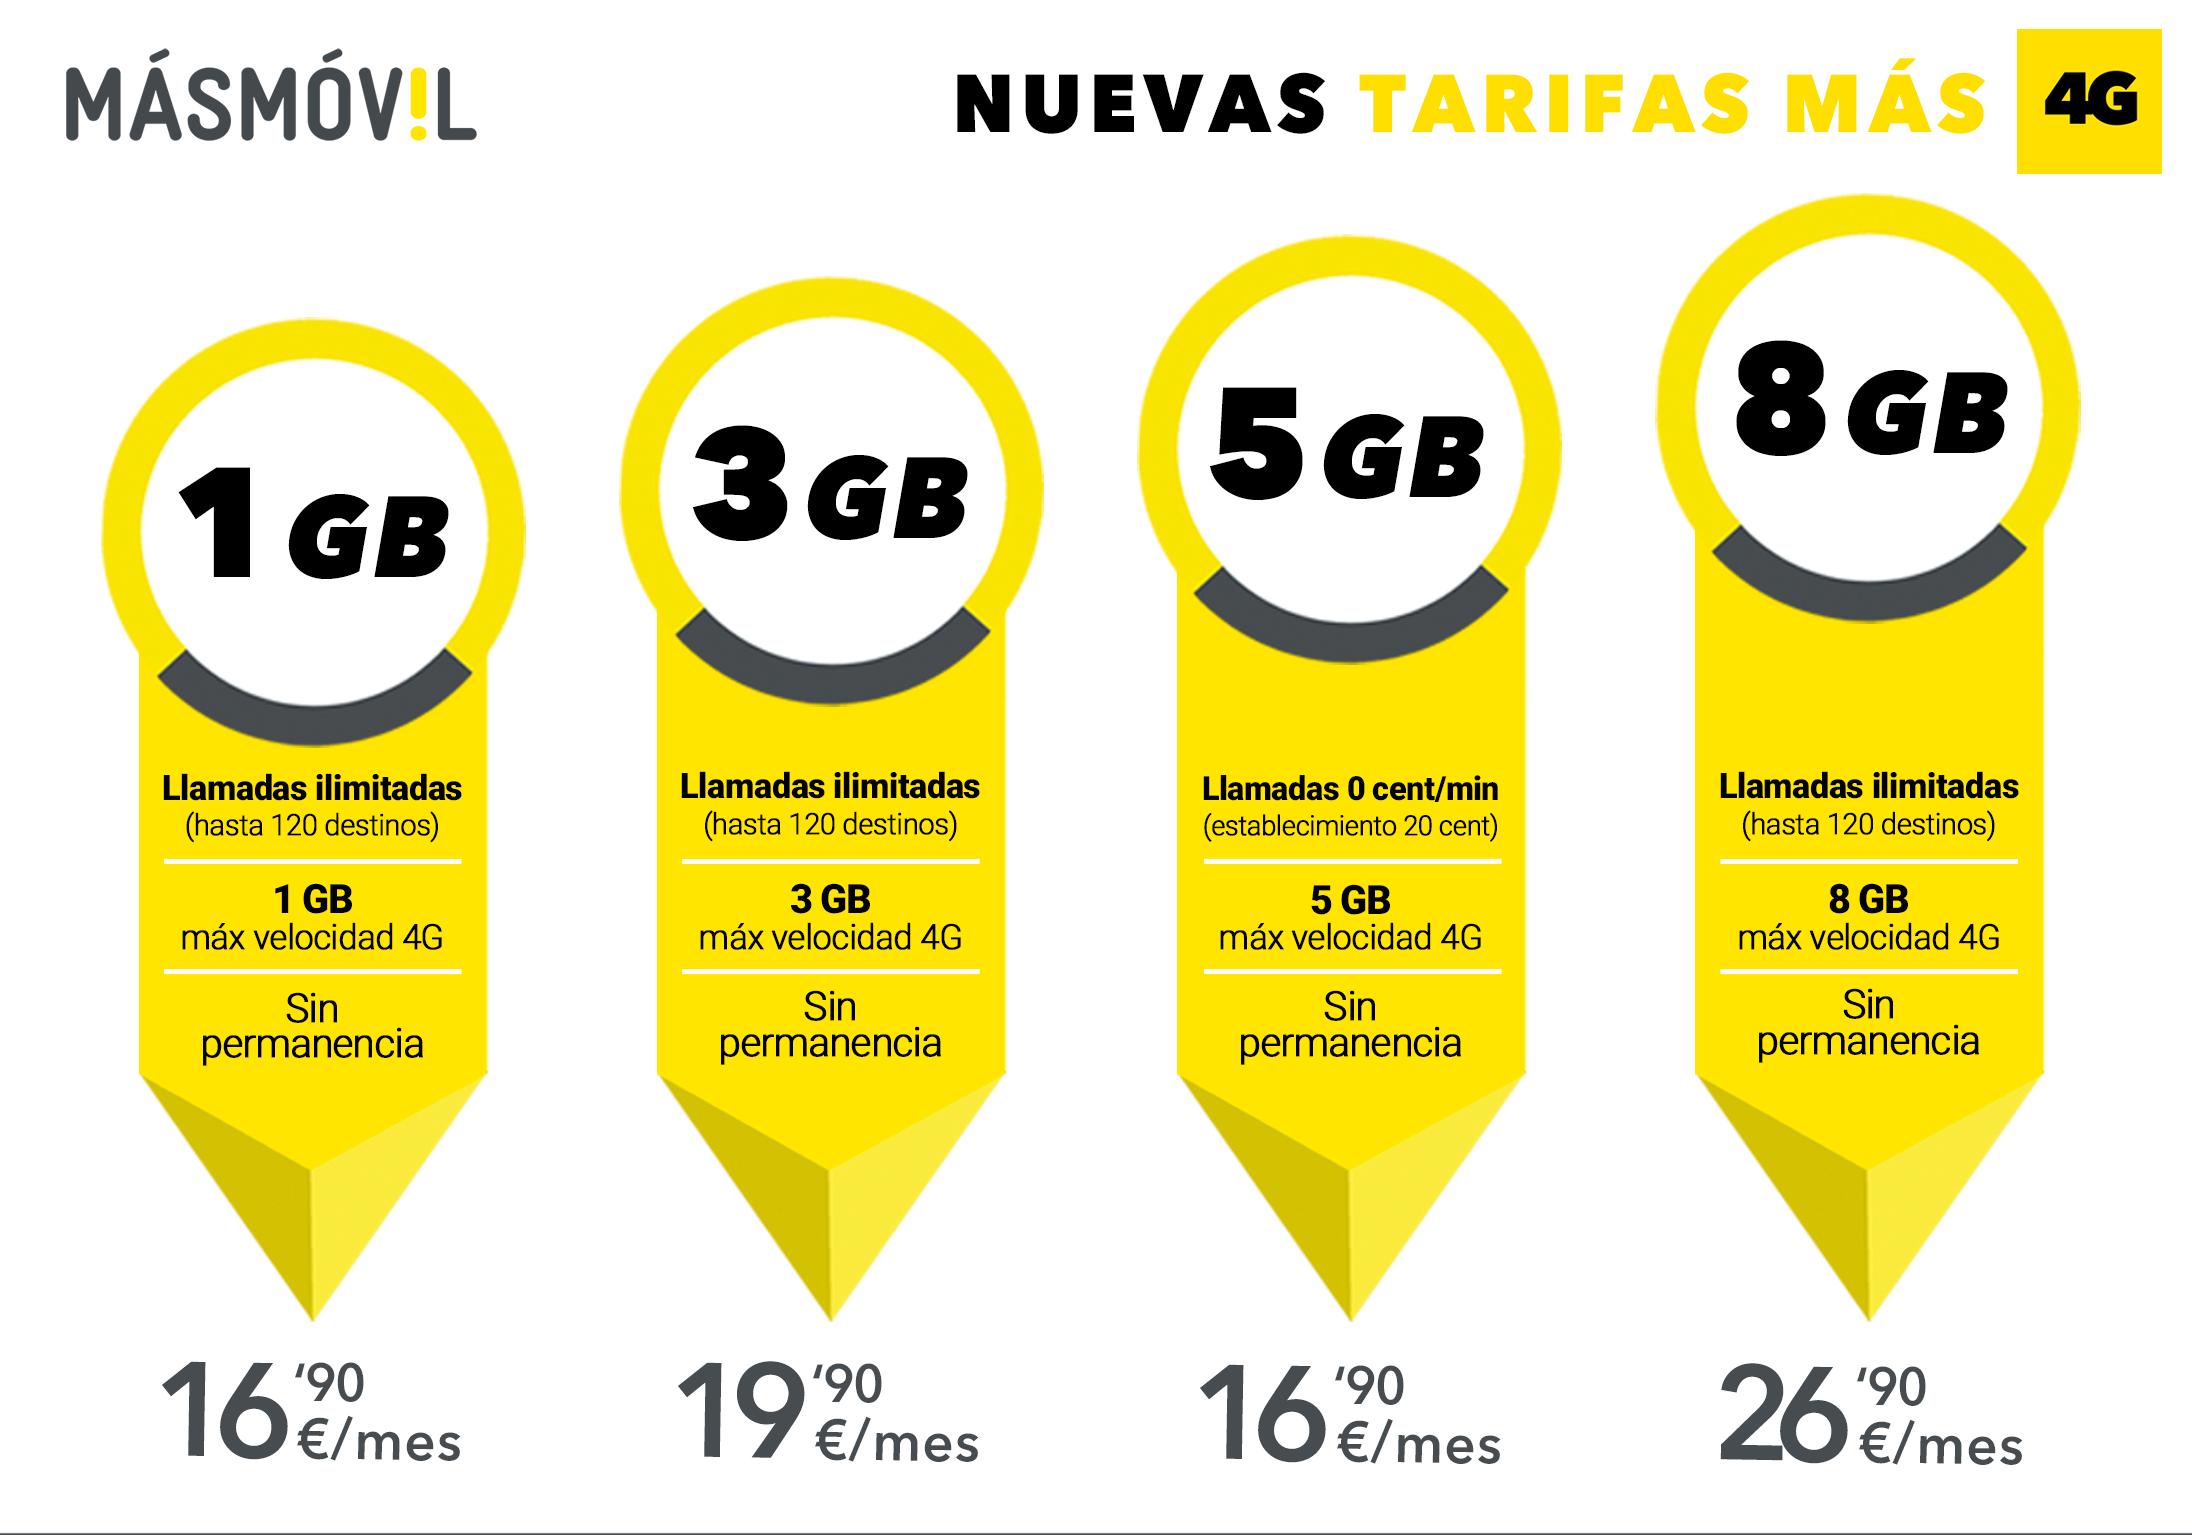 Tarifas MASMOVIL con 4G | Tarifas para móvil